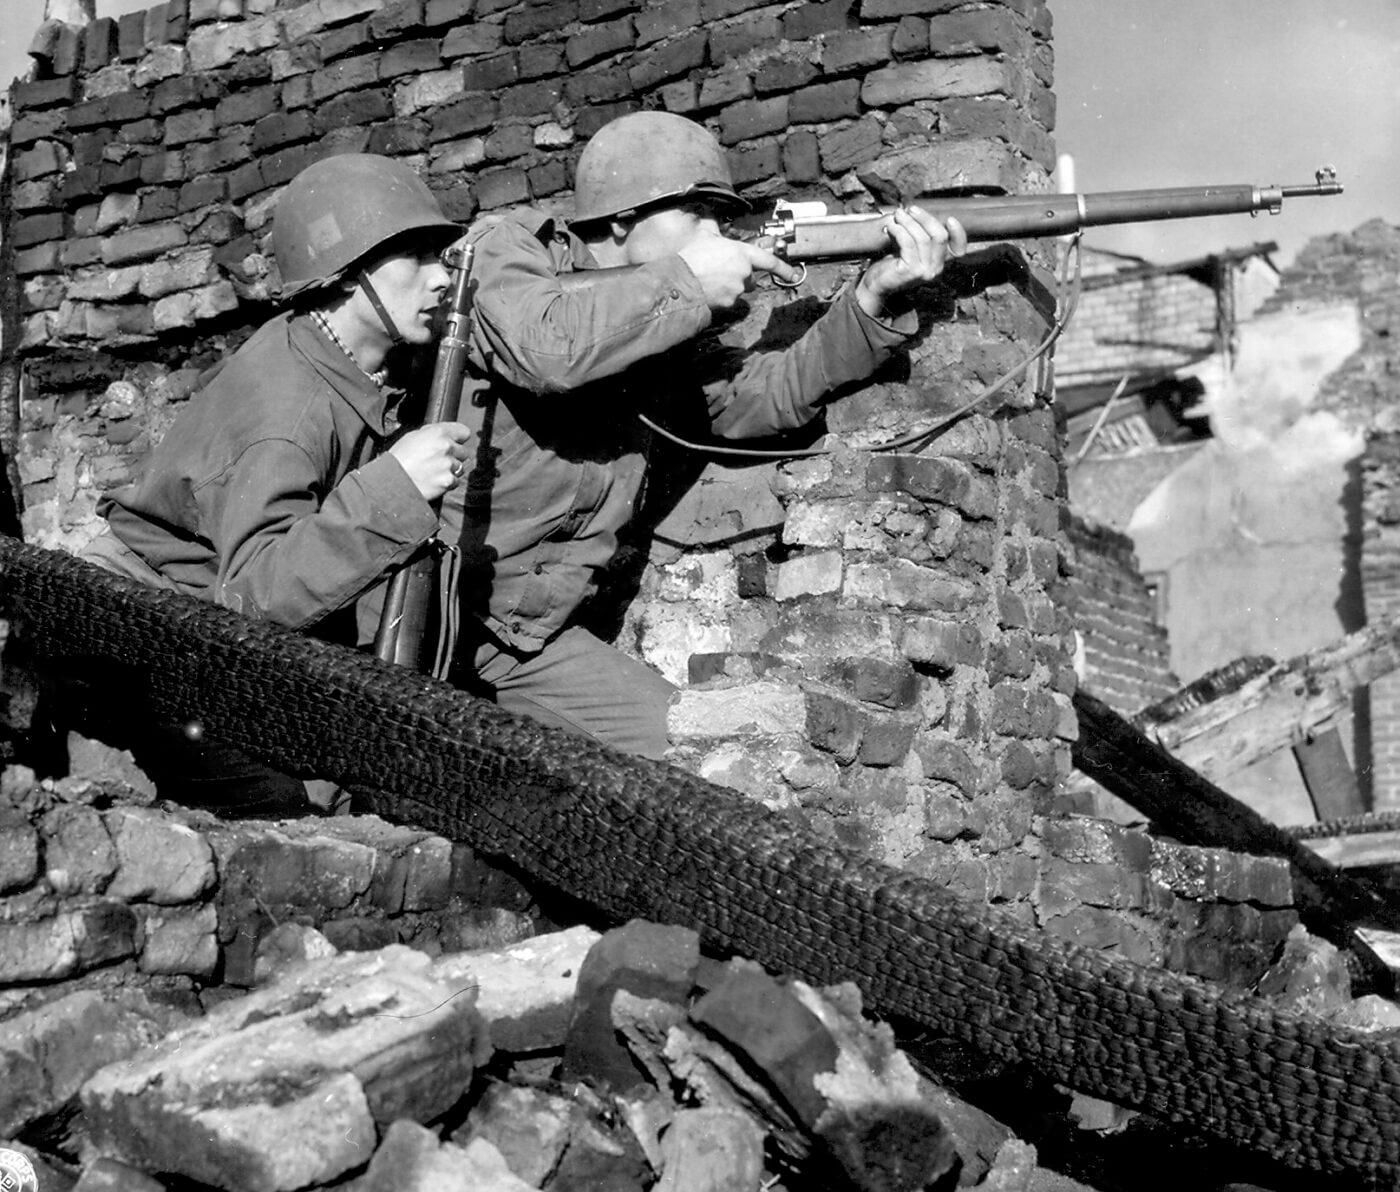 Dutch army soldier shooting M1917 rifle